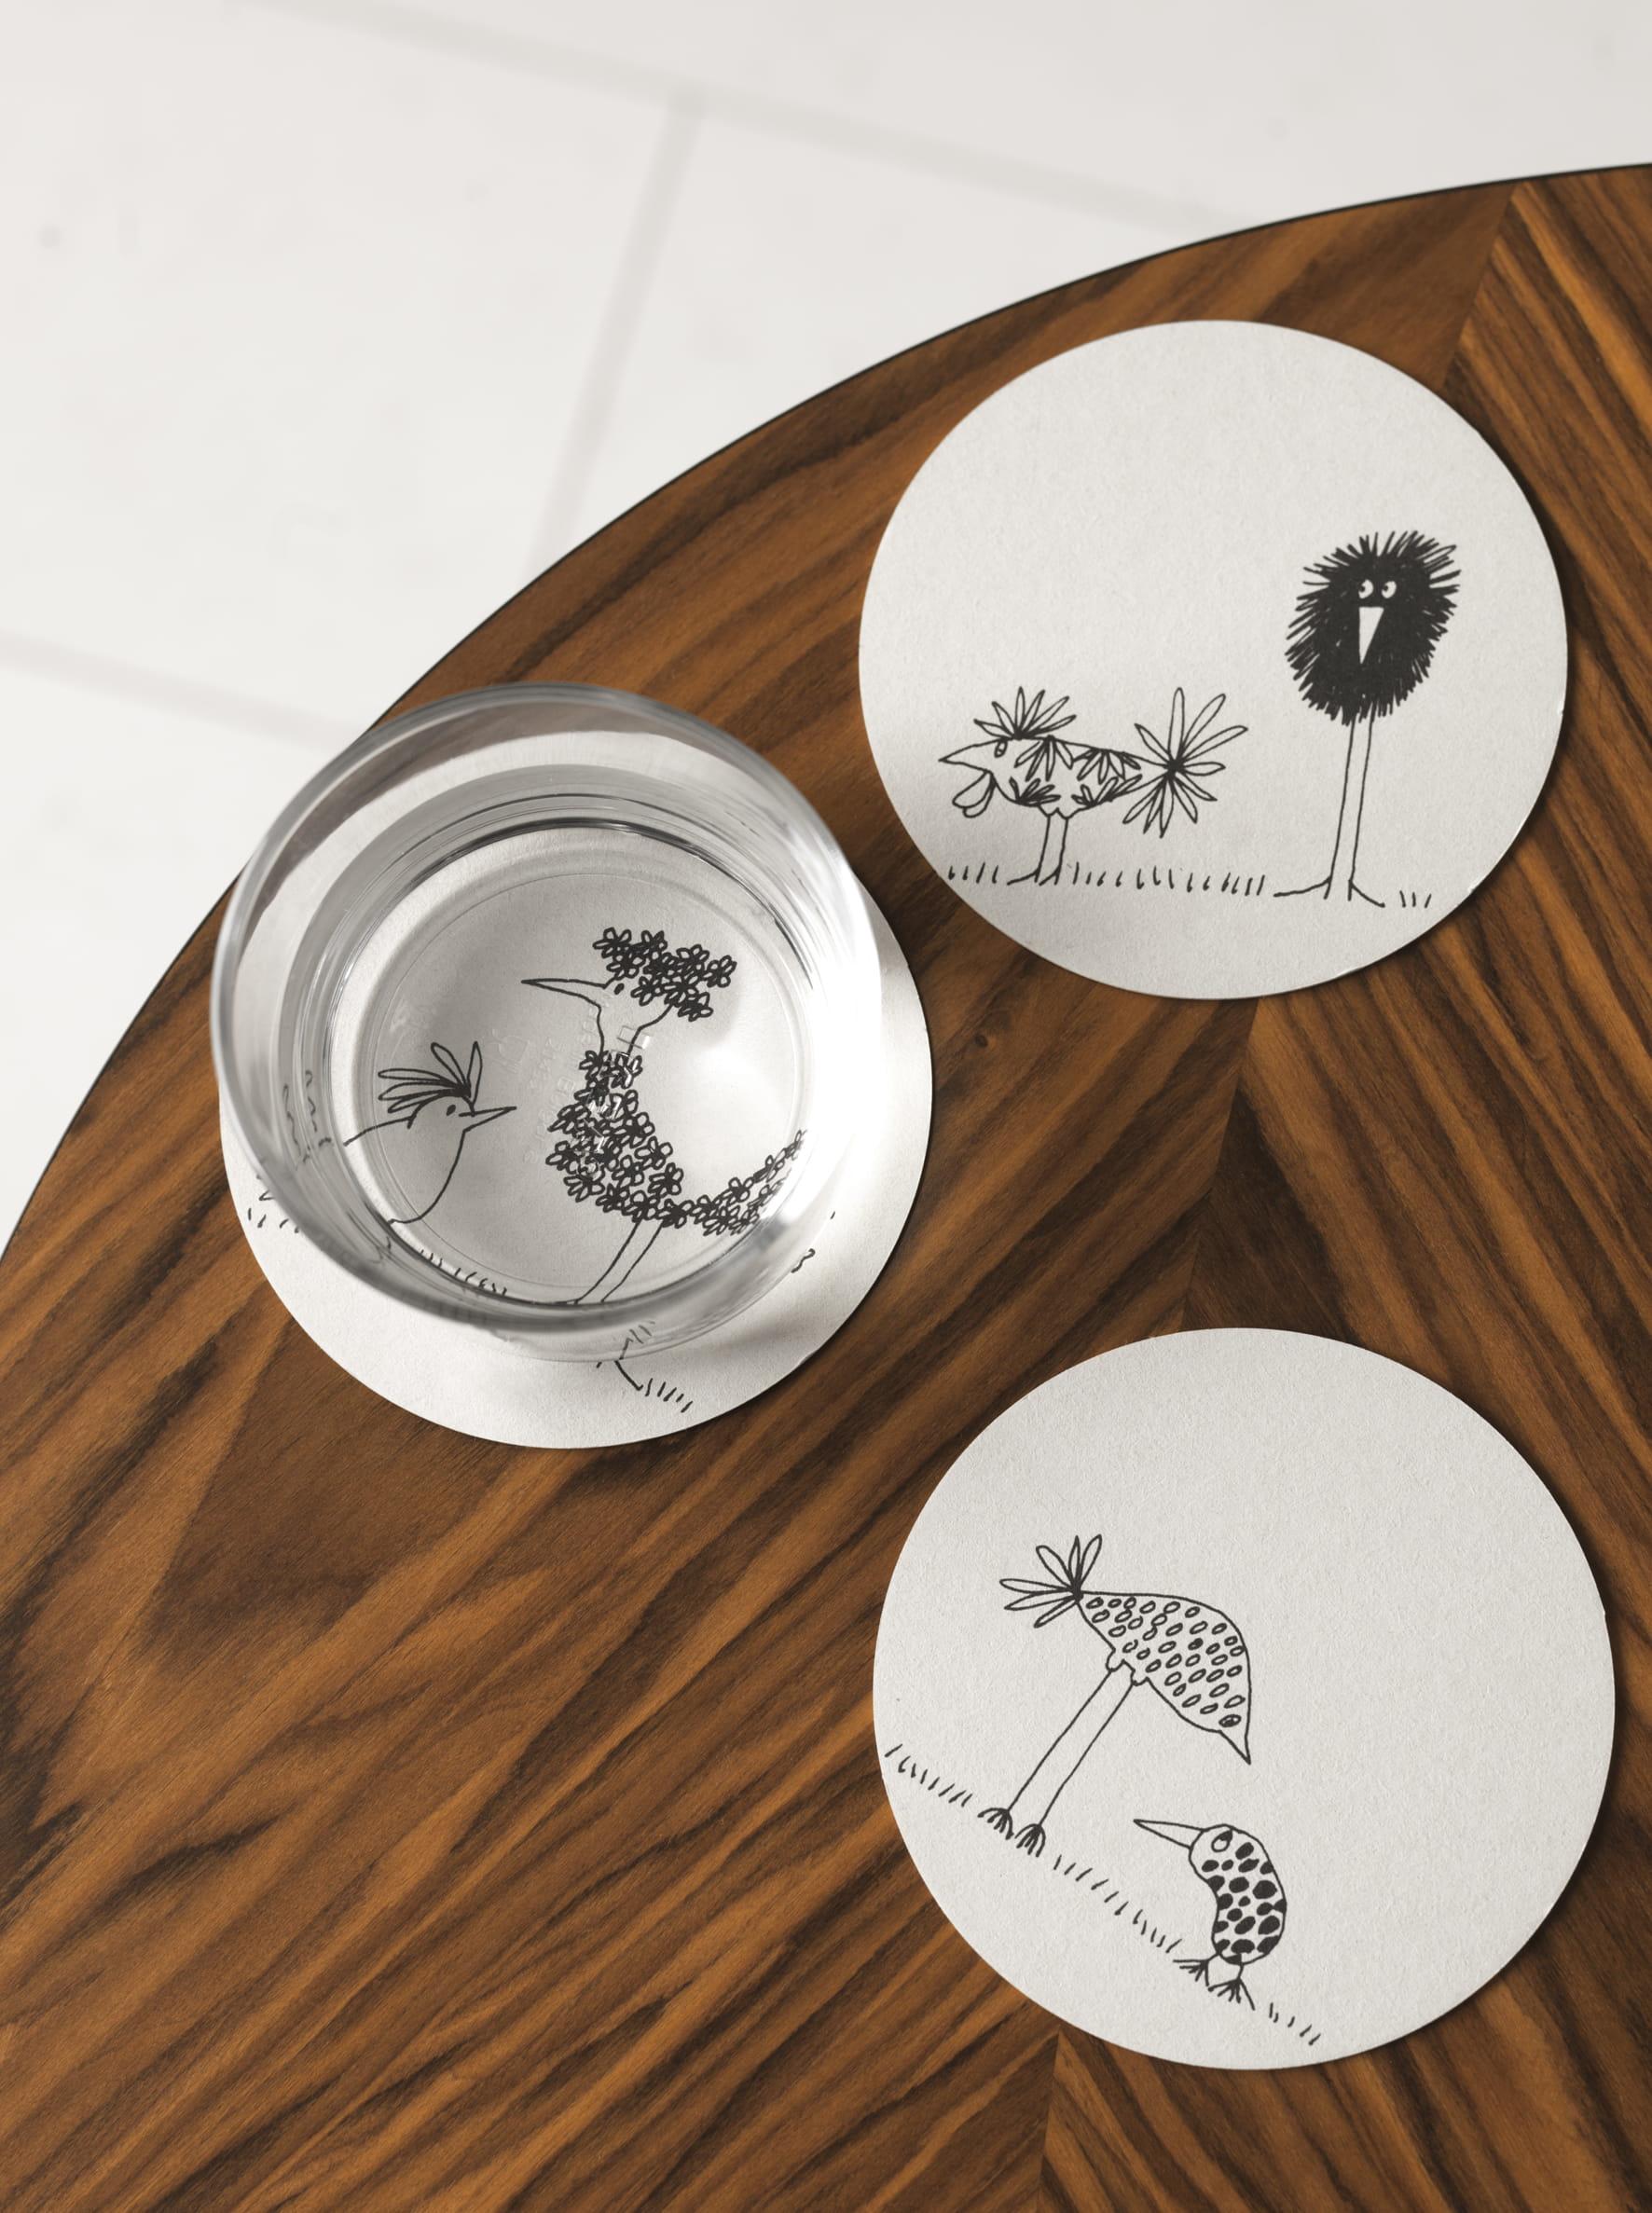 sous verre onskedrom ikea ikea une collection sous le signe du dessin journal des femmes. Black Bedroom Furniture Sets. Home Design Ideas